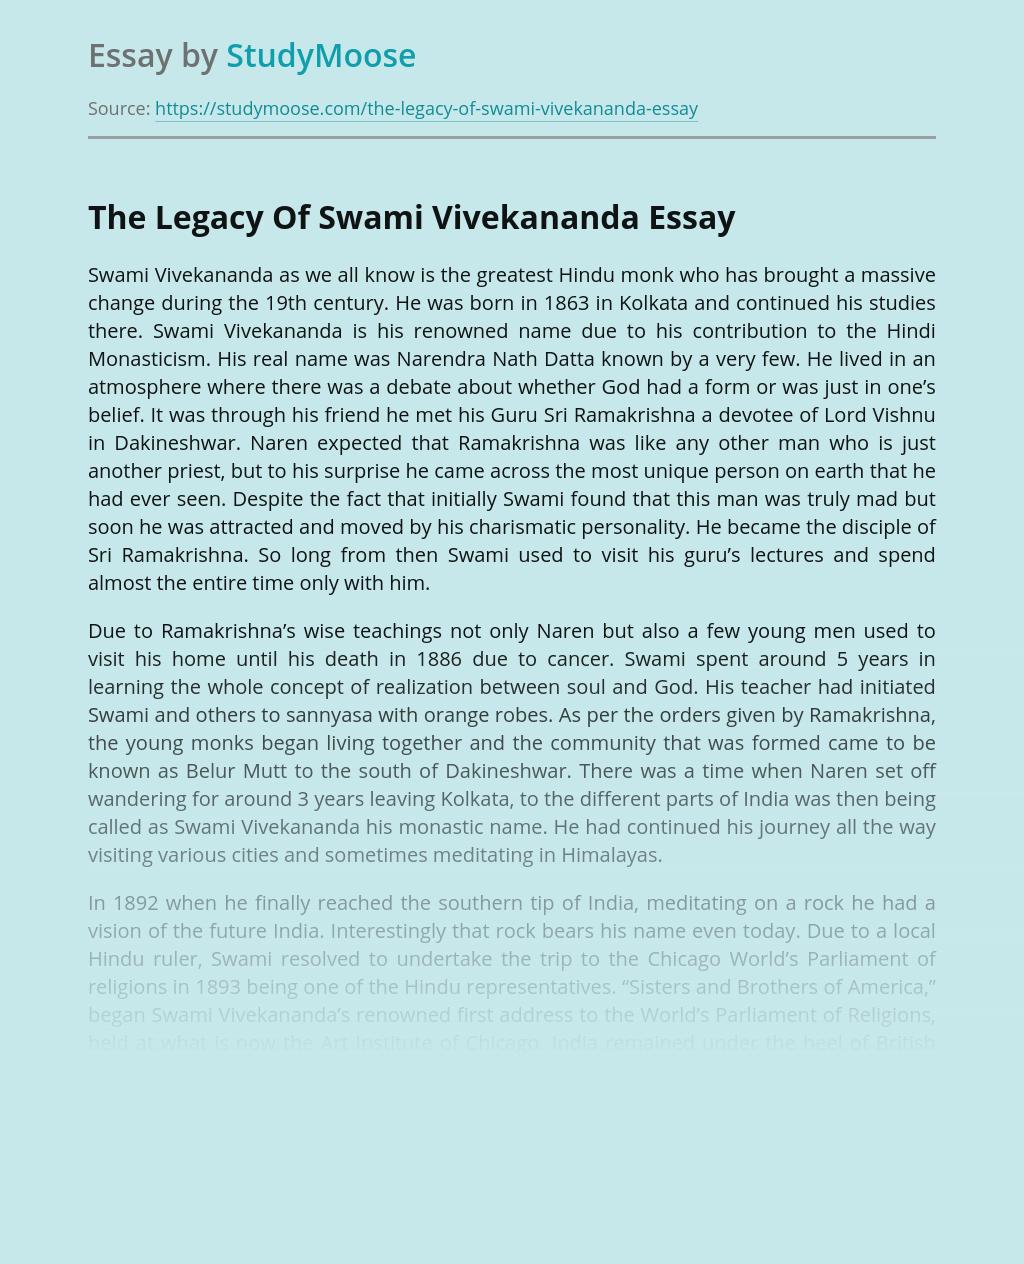 The Legacy Of Swami Vivekananda